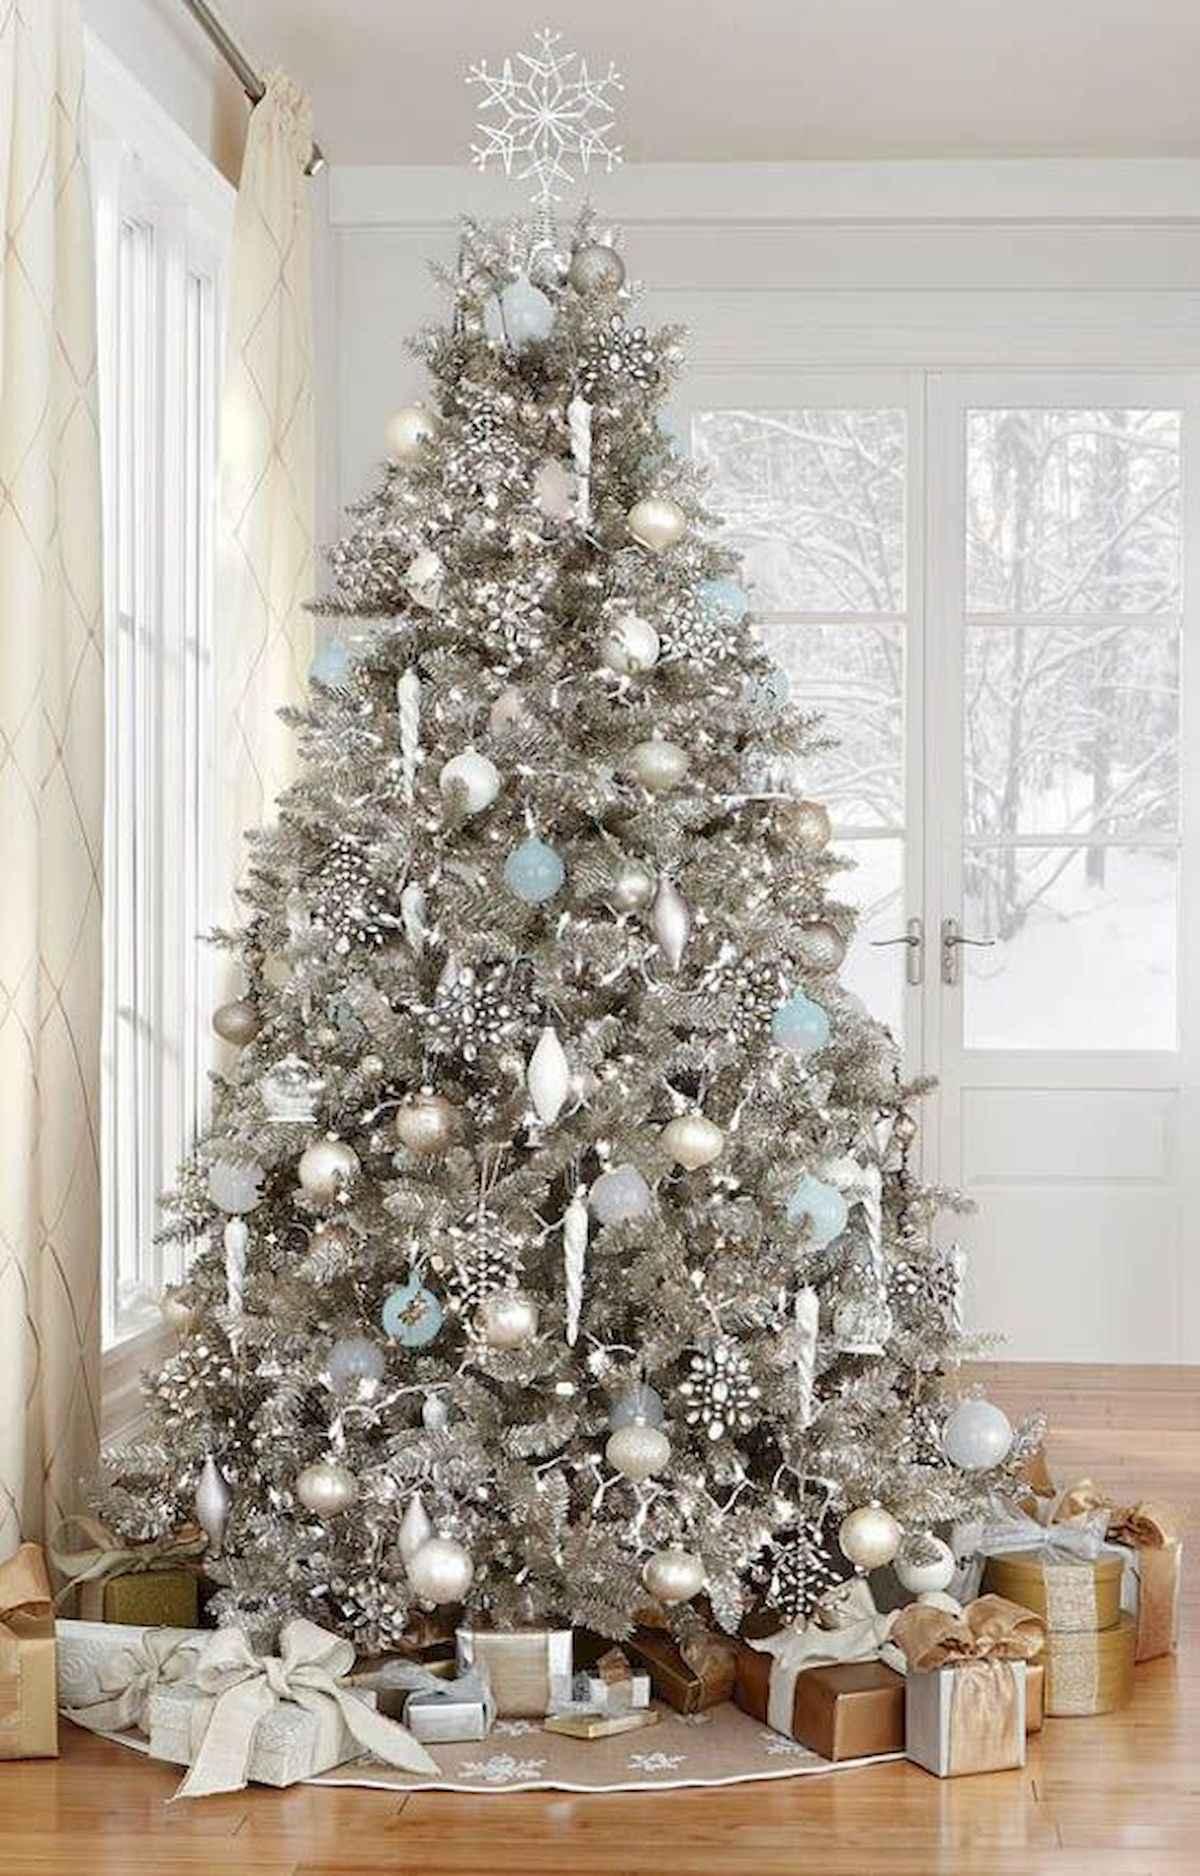 40 elegant christmas tree decorations ideas (4)